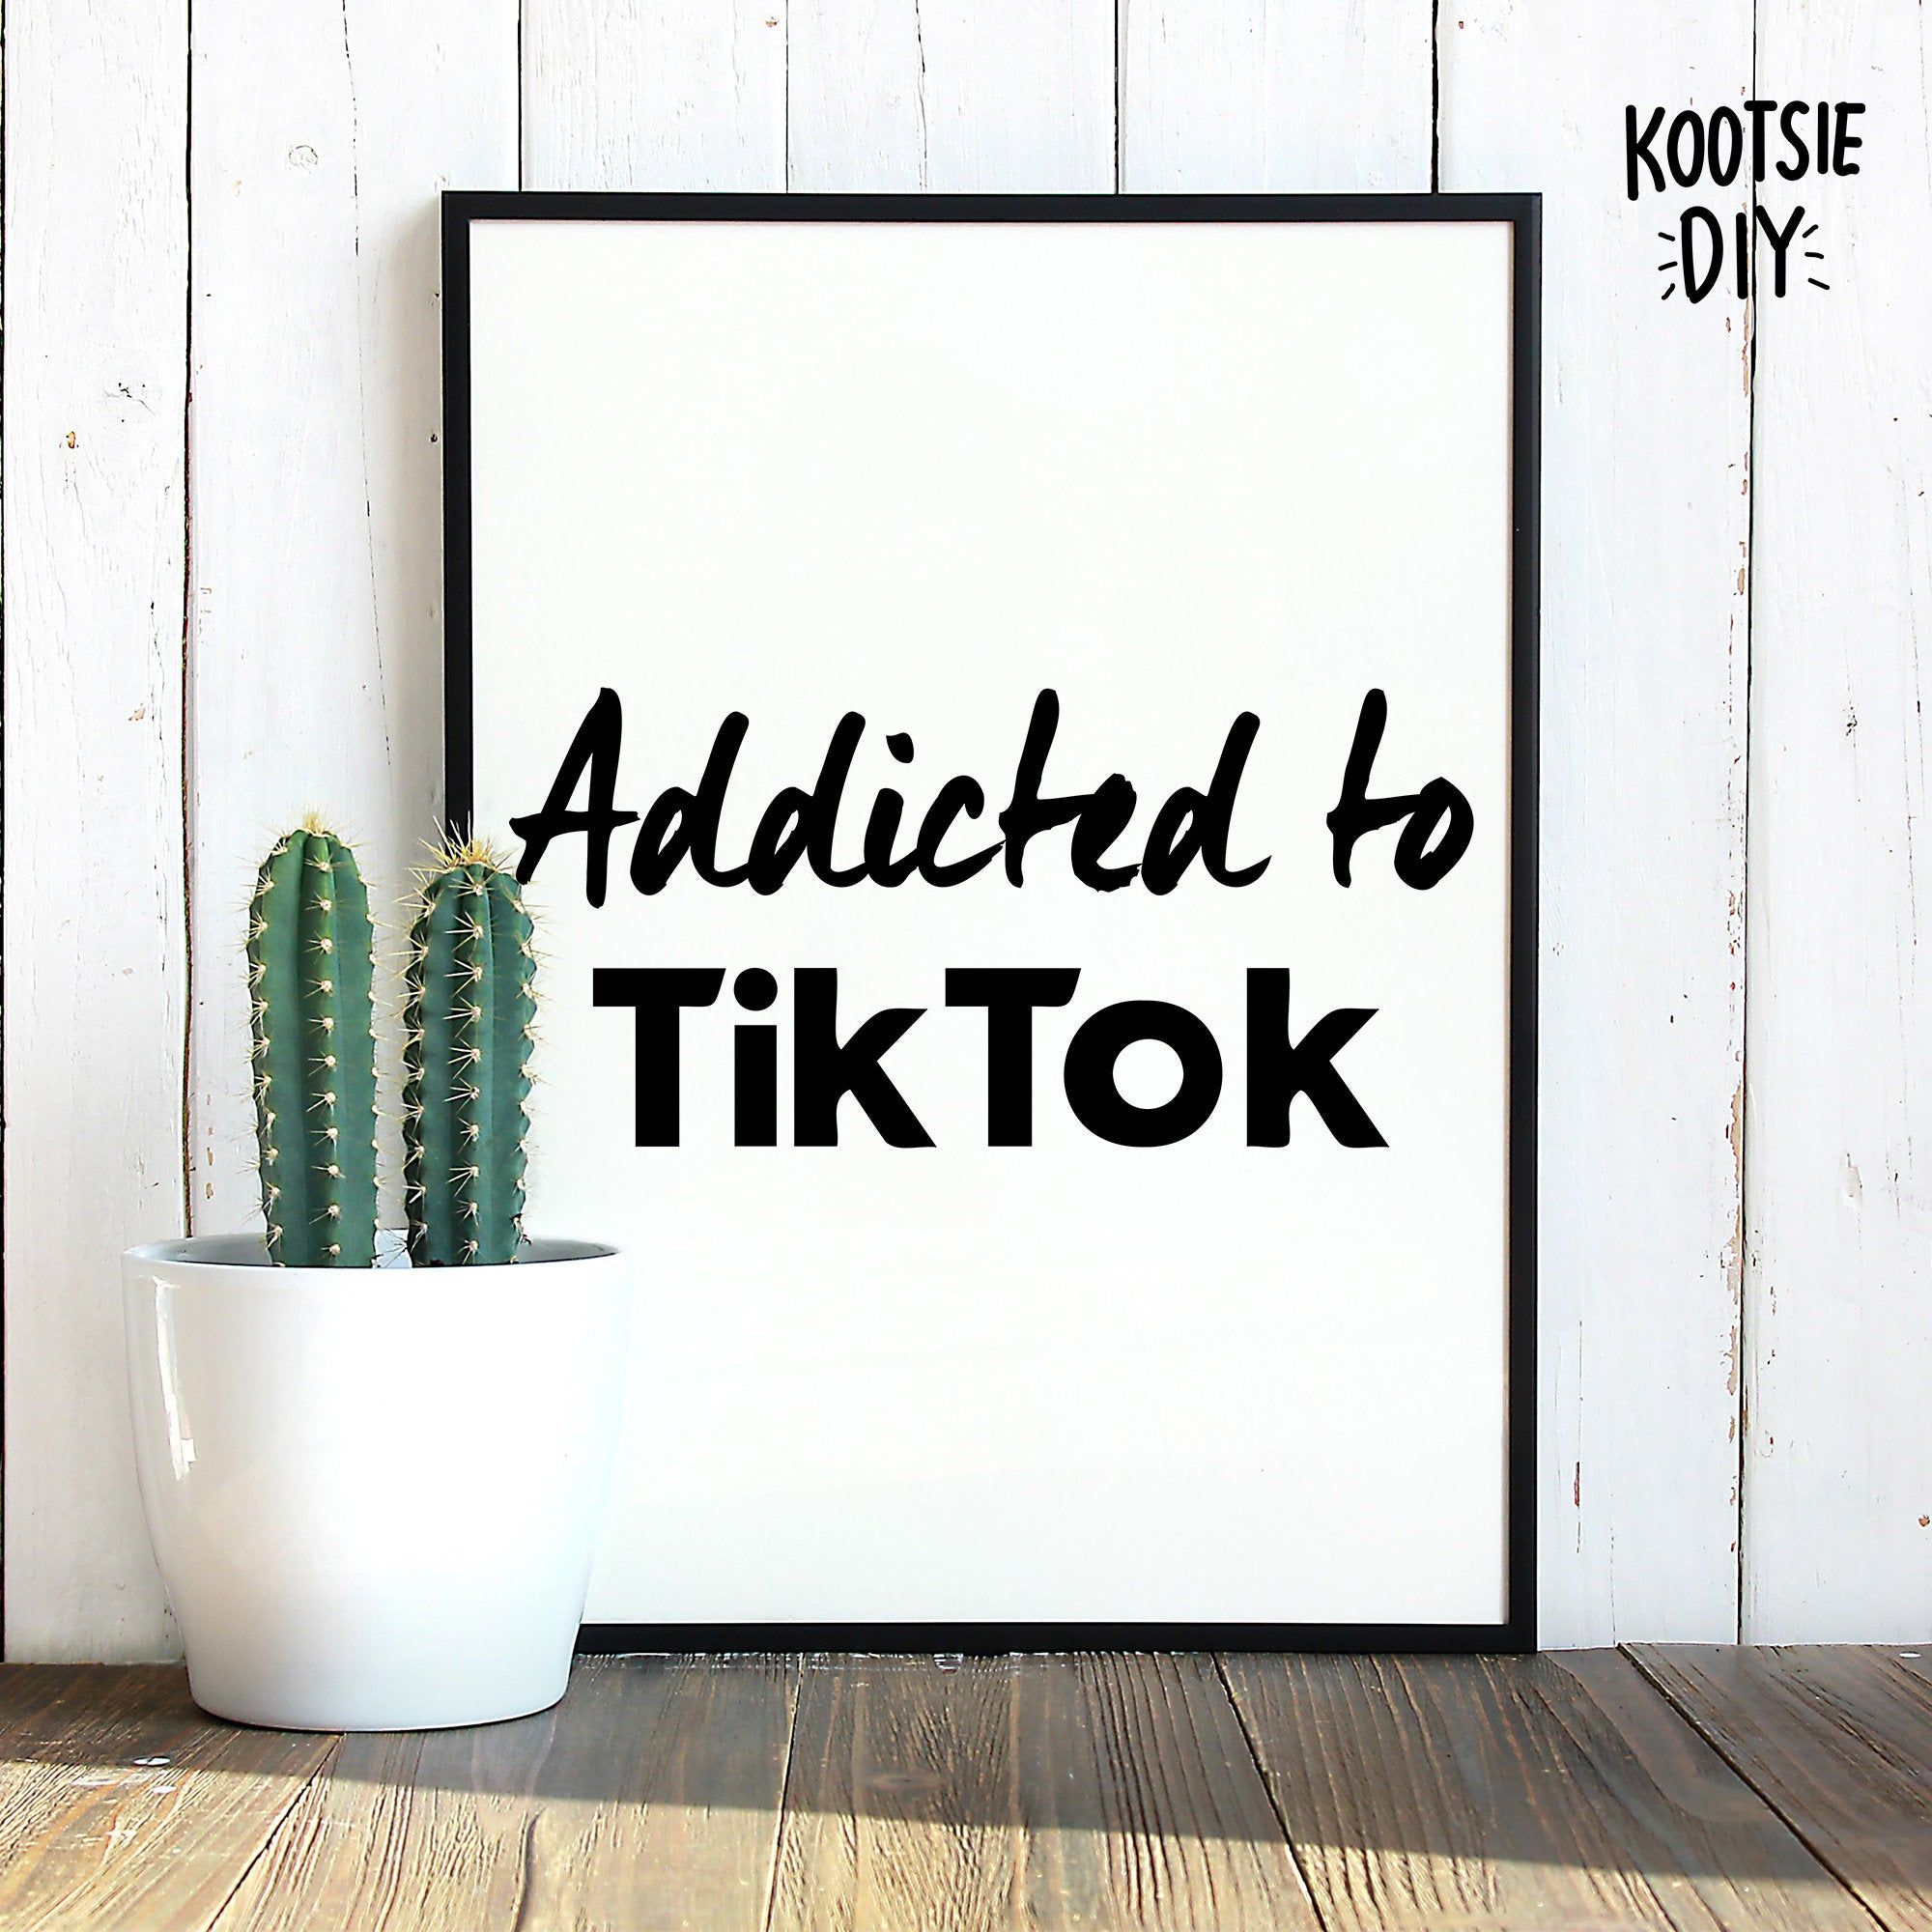 Tiktok Merch Svg Tiktok Svg Tiktok Png Tiktok Gift Etsy My Design New Shop Instagram